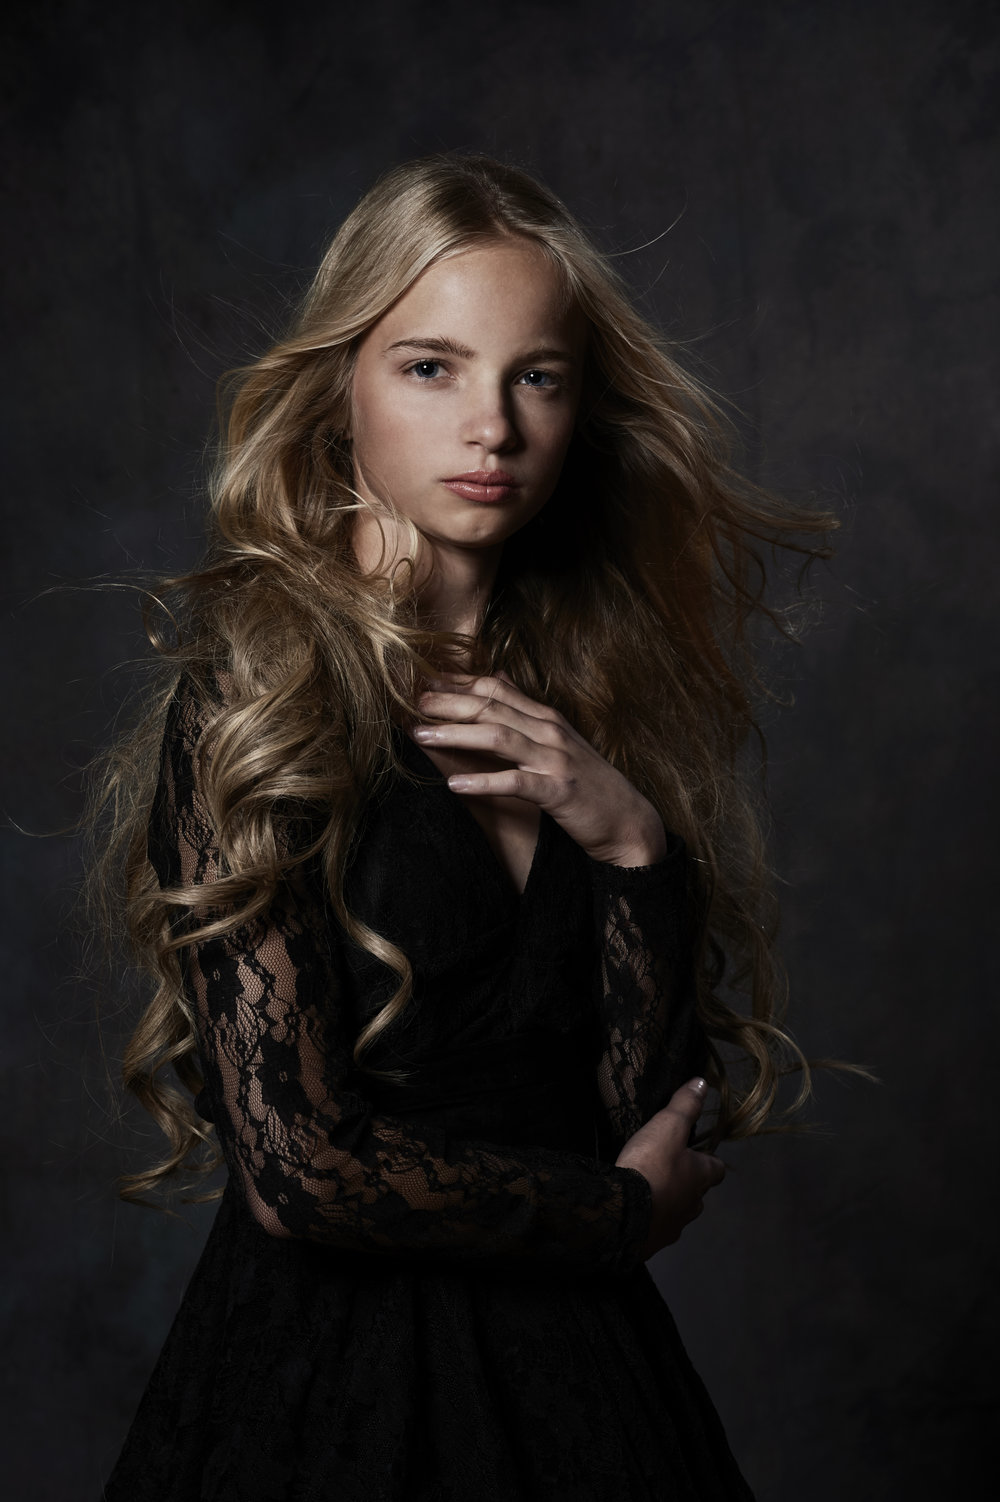 Marta-Hewson-Themed-portrait-fashion-hair-extentions-blowing.jpg